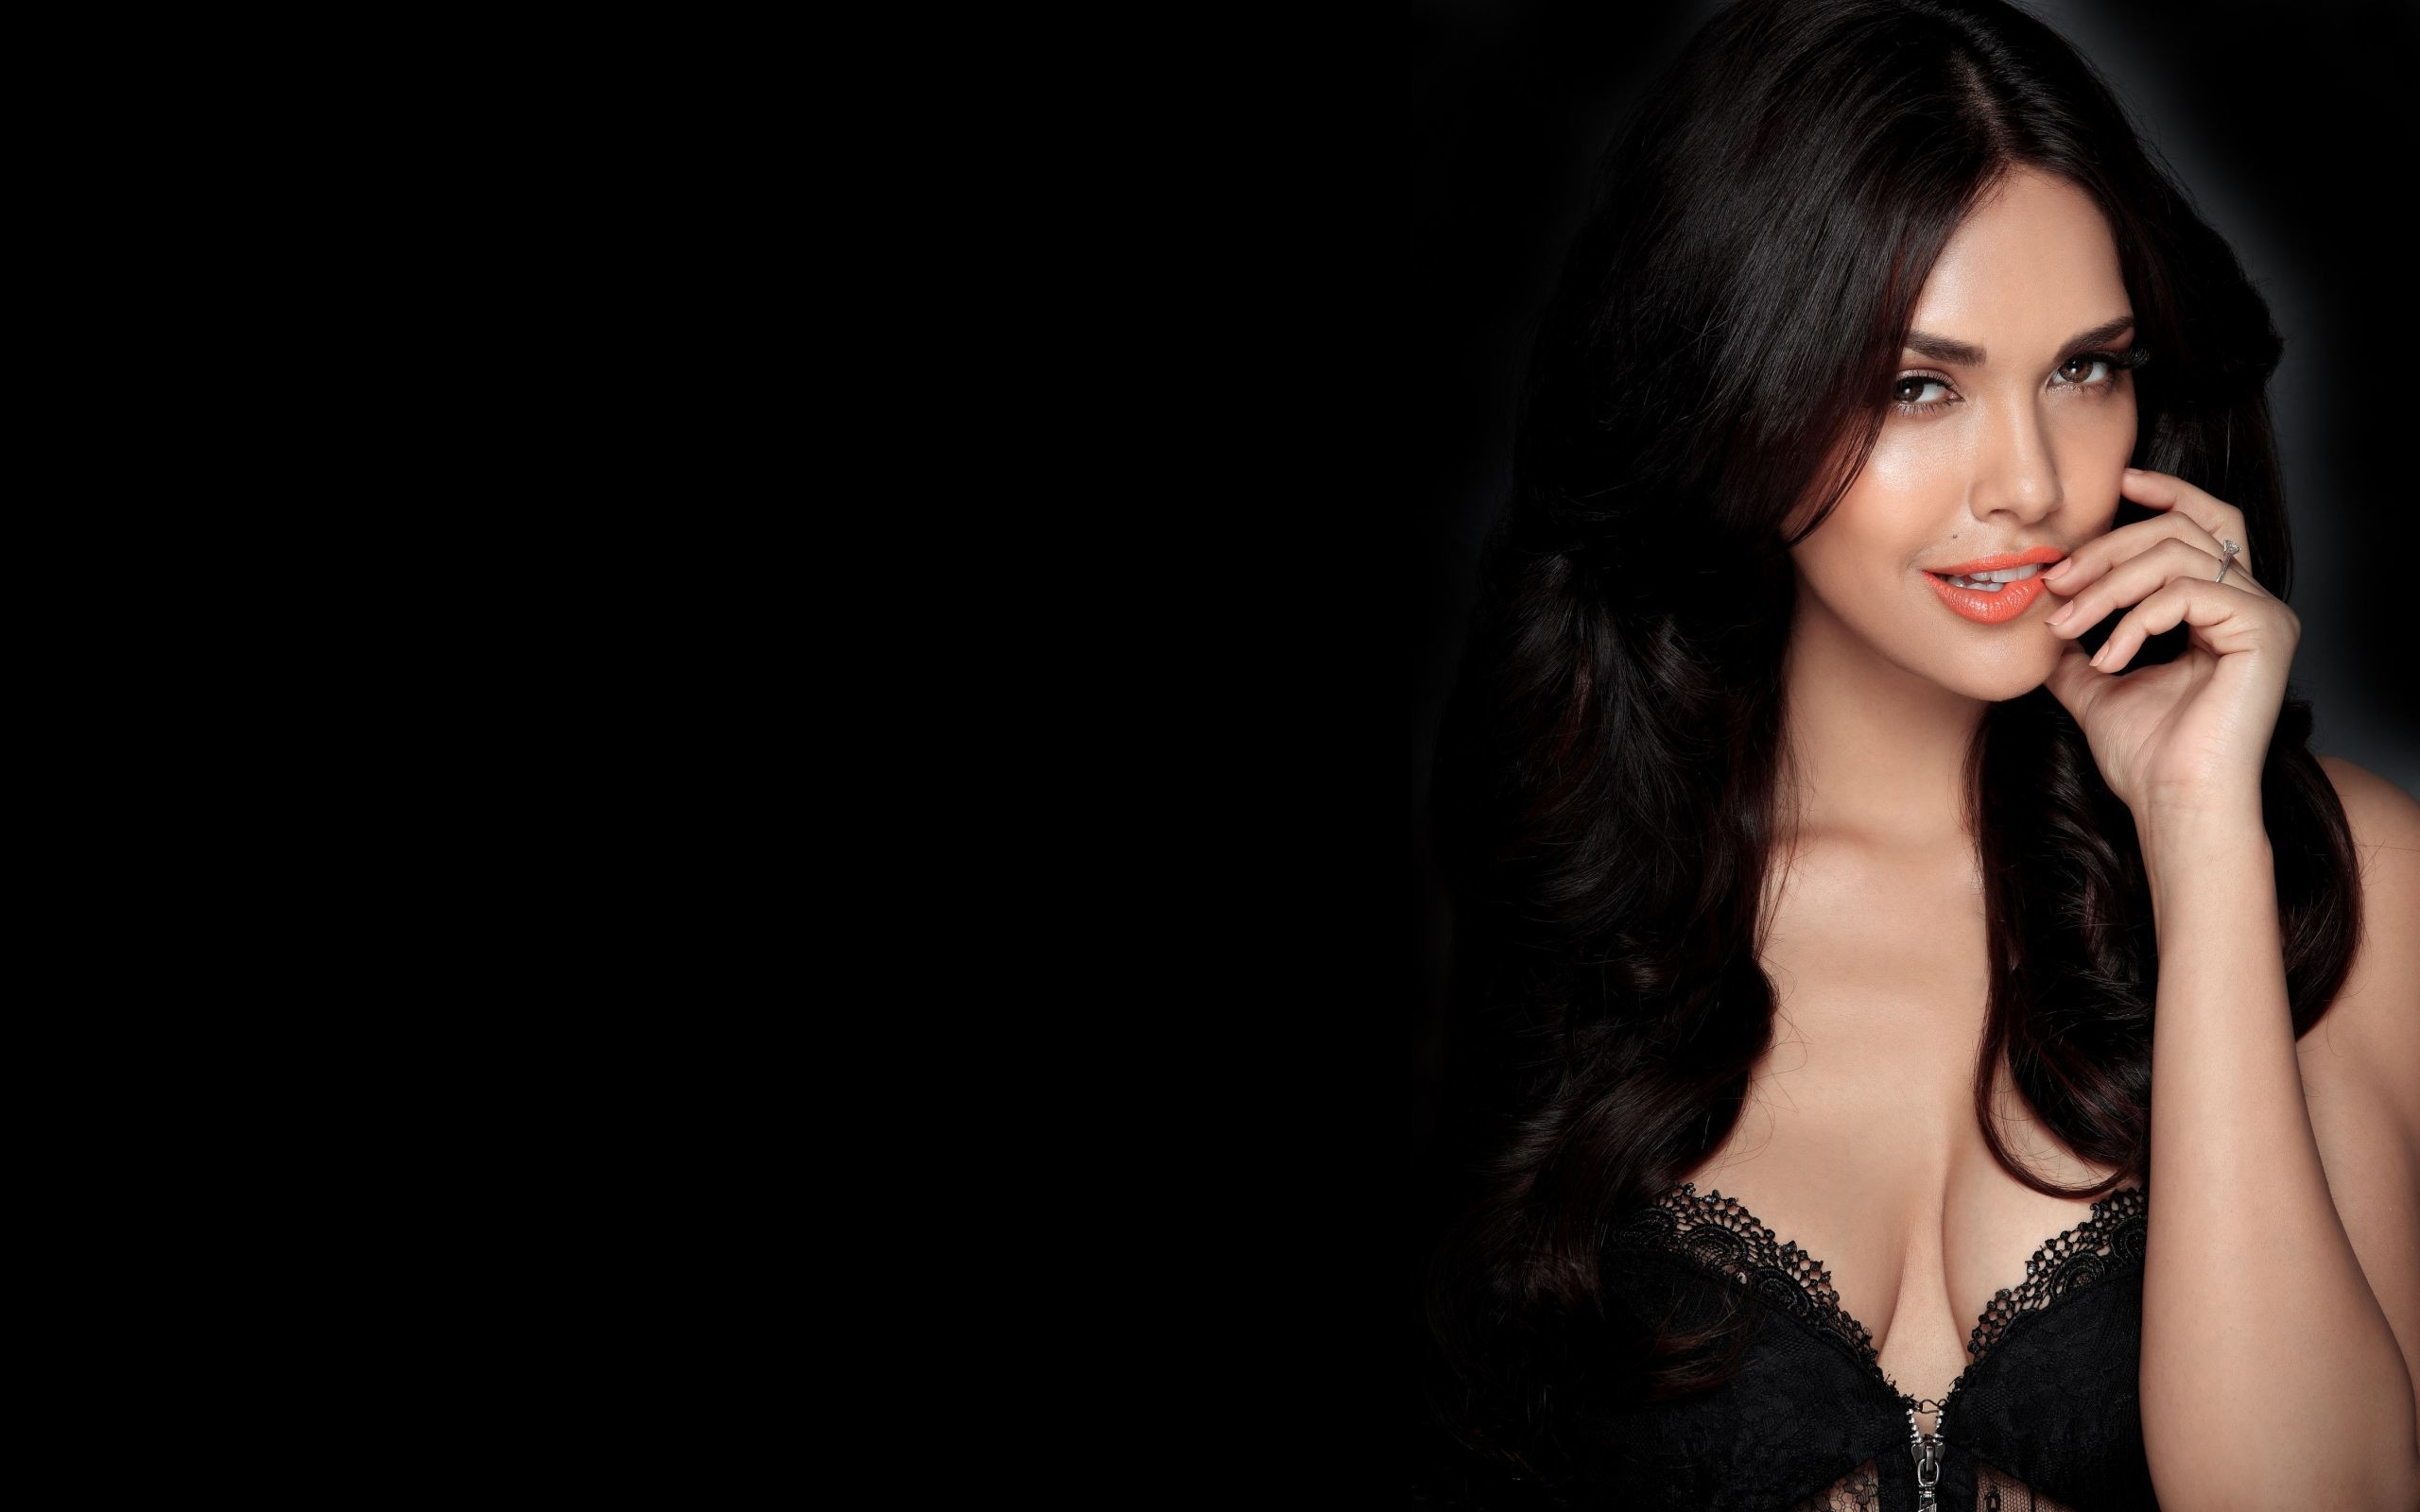 High quality erotic photos of women bravo